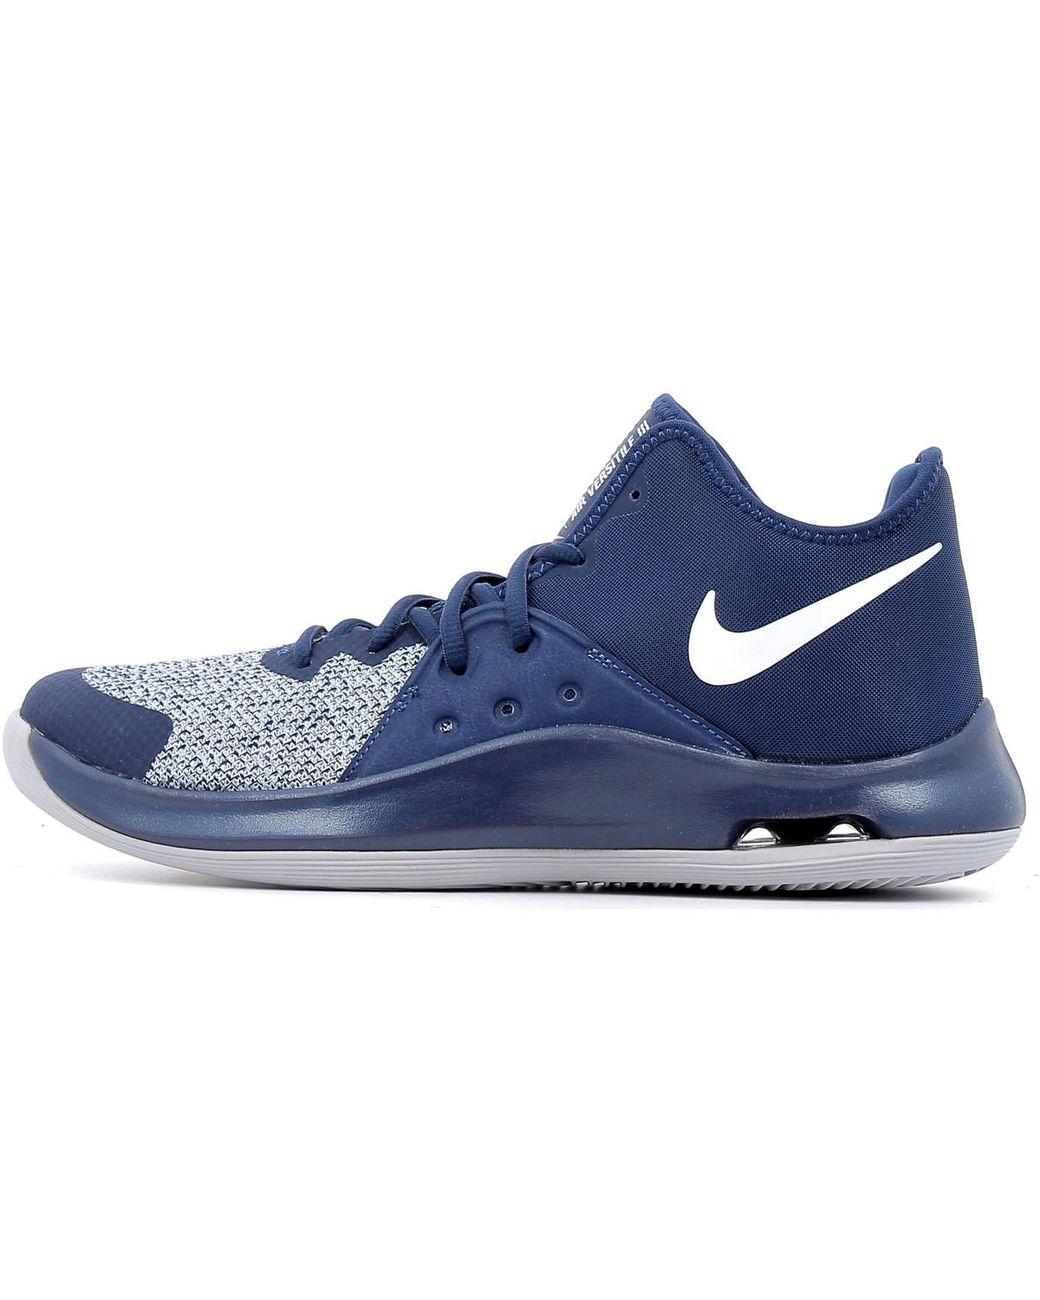 Hommes Air Iii Chaussures Versitile En Bleu F1c3TuKJl